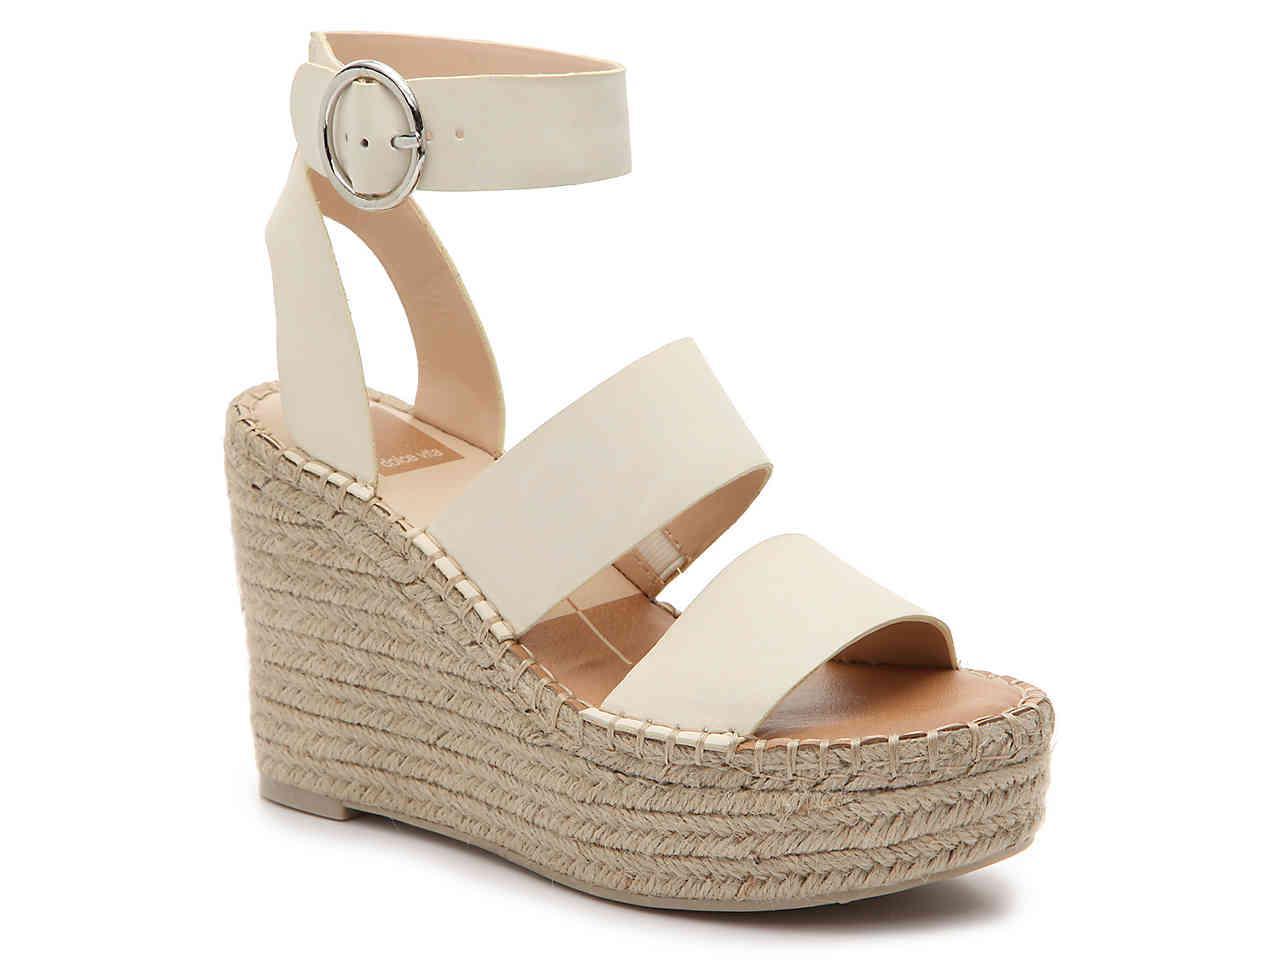 94a1c2ec9b04 Dolce Vita Shae Espadrille Wedge Sandal in White - Lyst